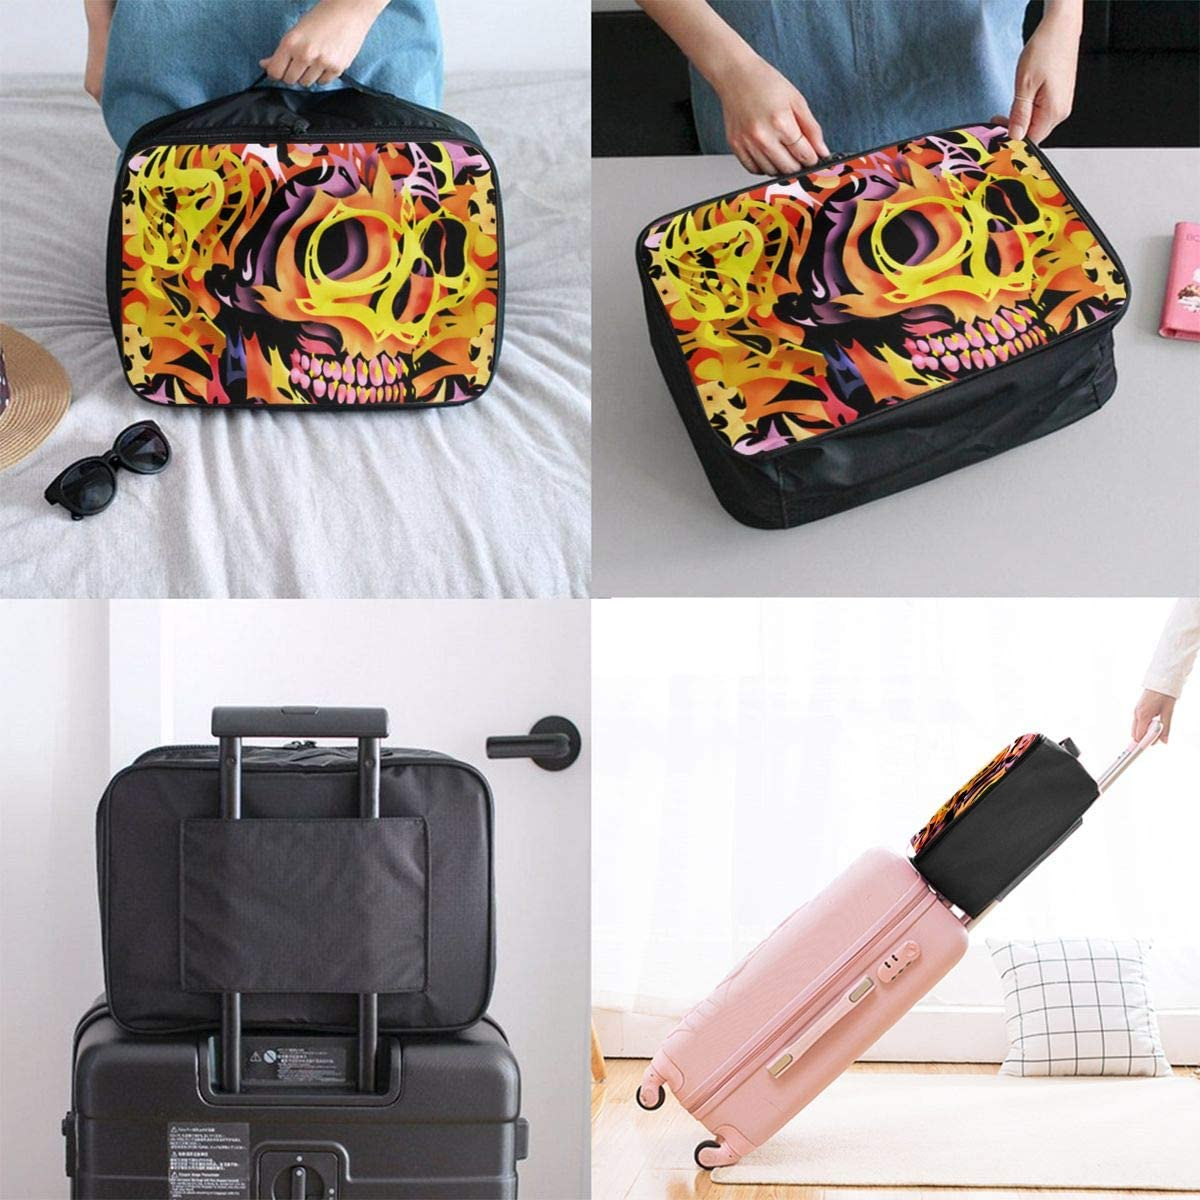 Skull Art Travel Carry-on Luggage Weekender Bag Overnight Tote Flight Duffel In Trolley Handle